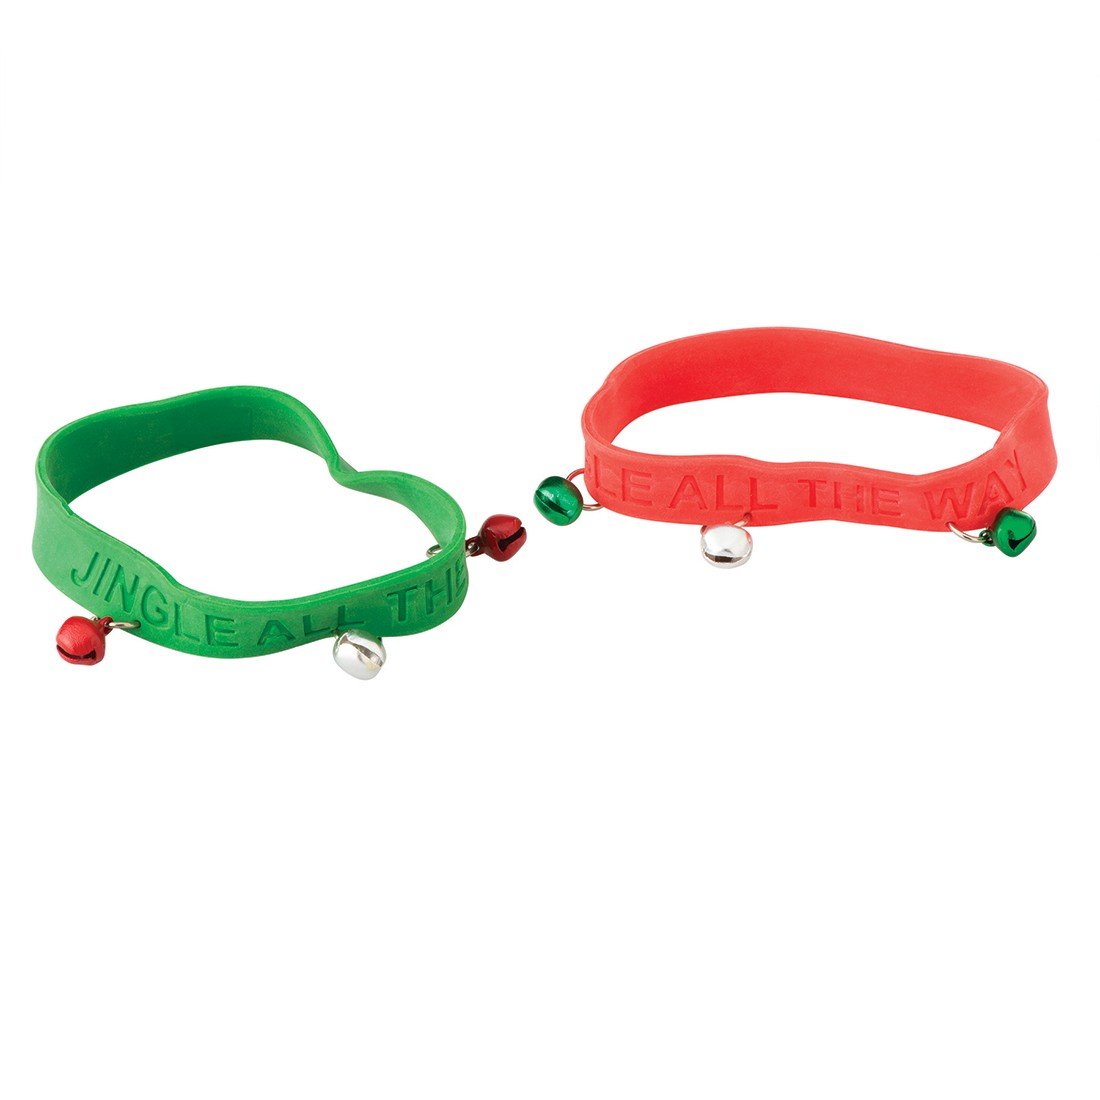 Jingle Bell Rubber Bracelets [image]